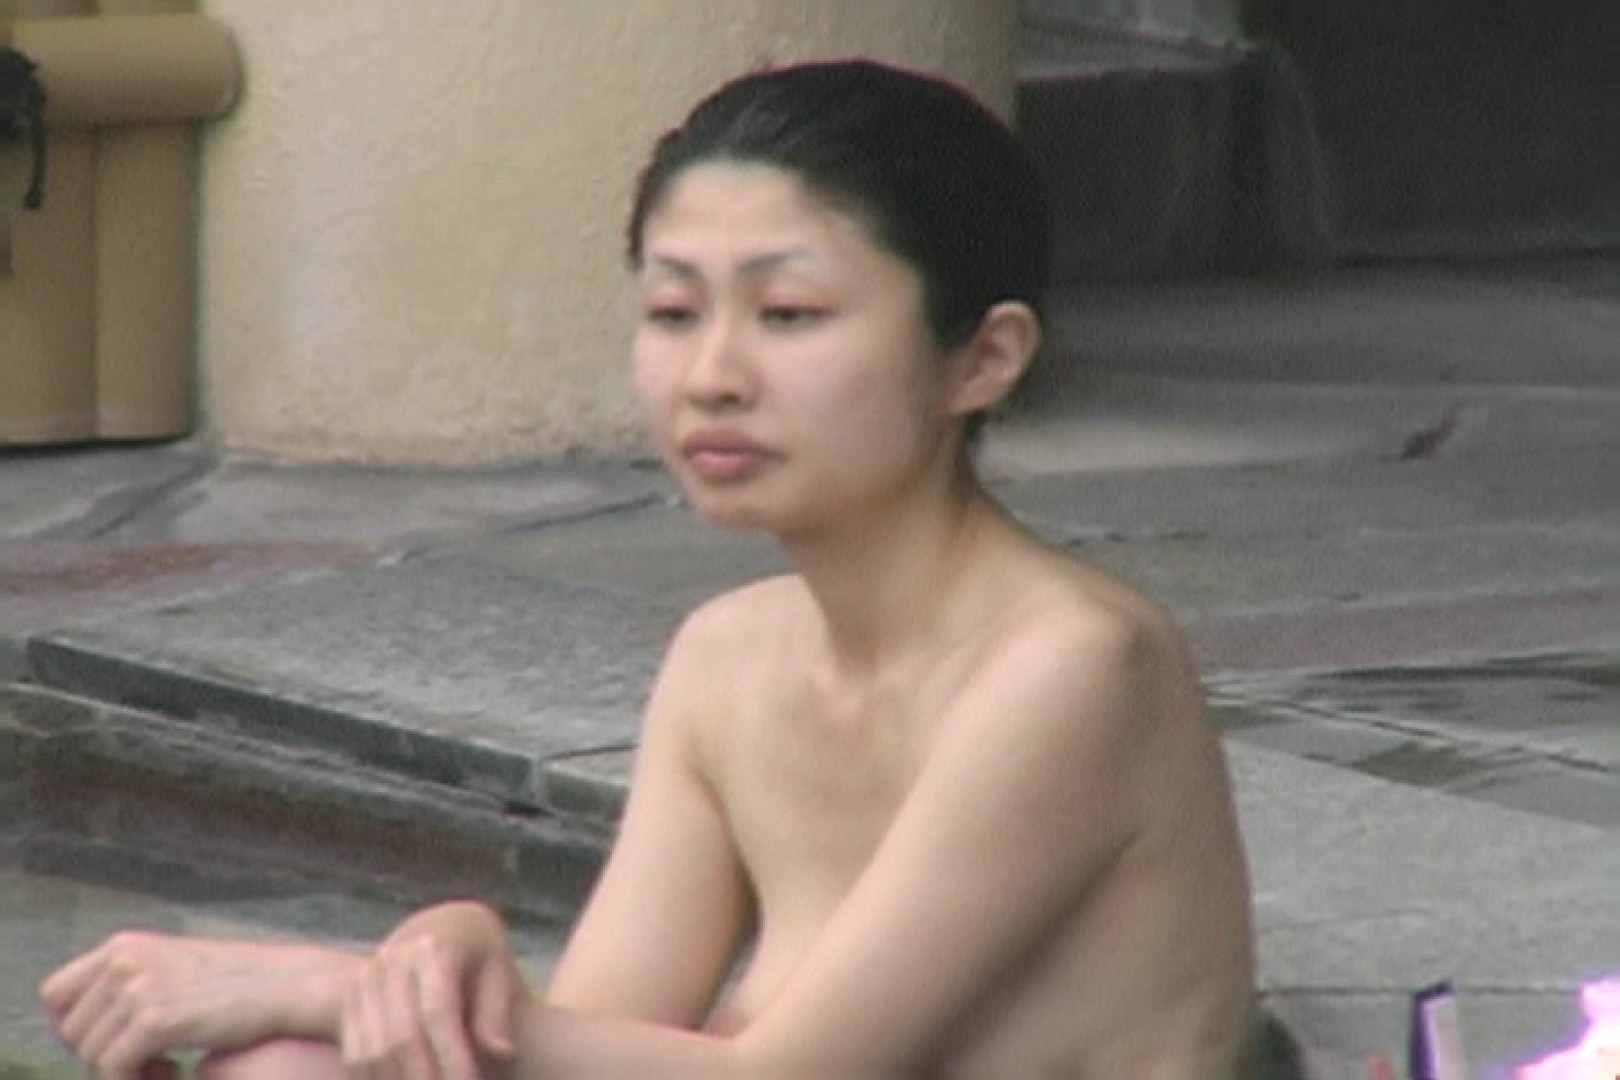 Aquaな露天風呂Vol.642 美しいOLの裸体 | 露天風呂突入  86pic 37